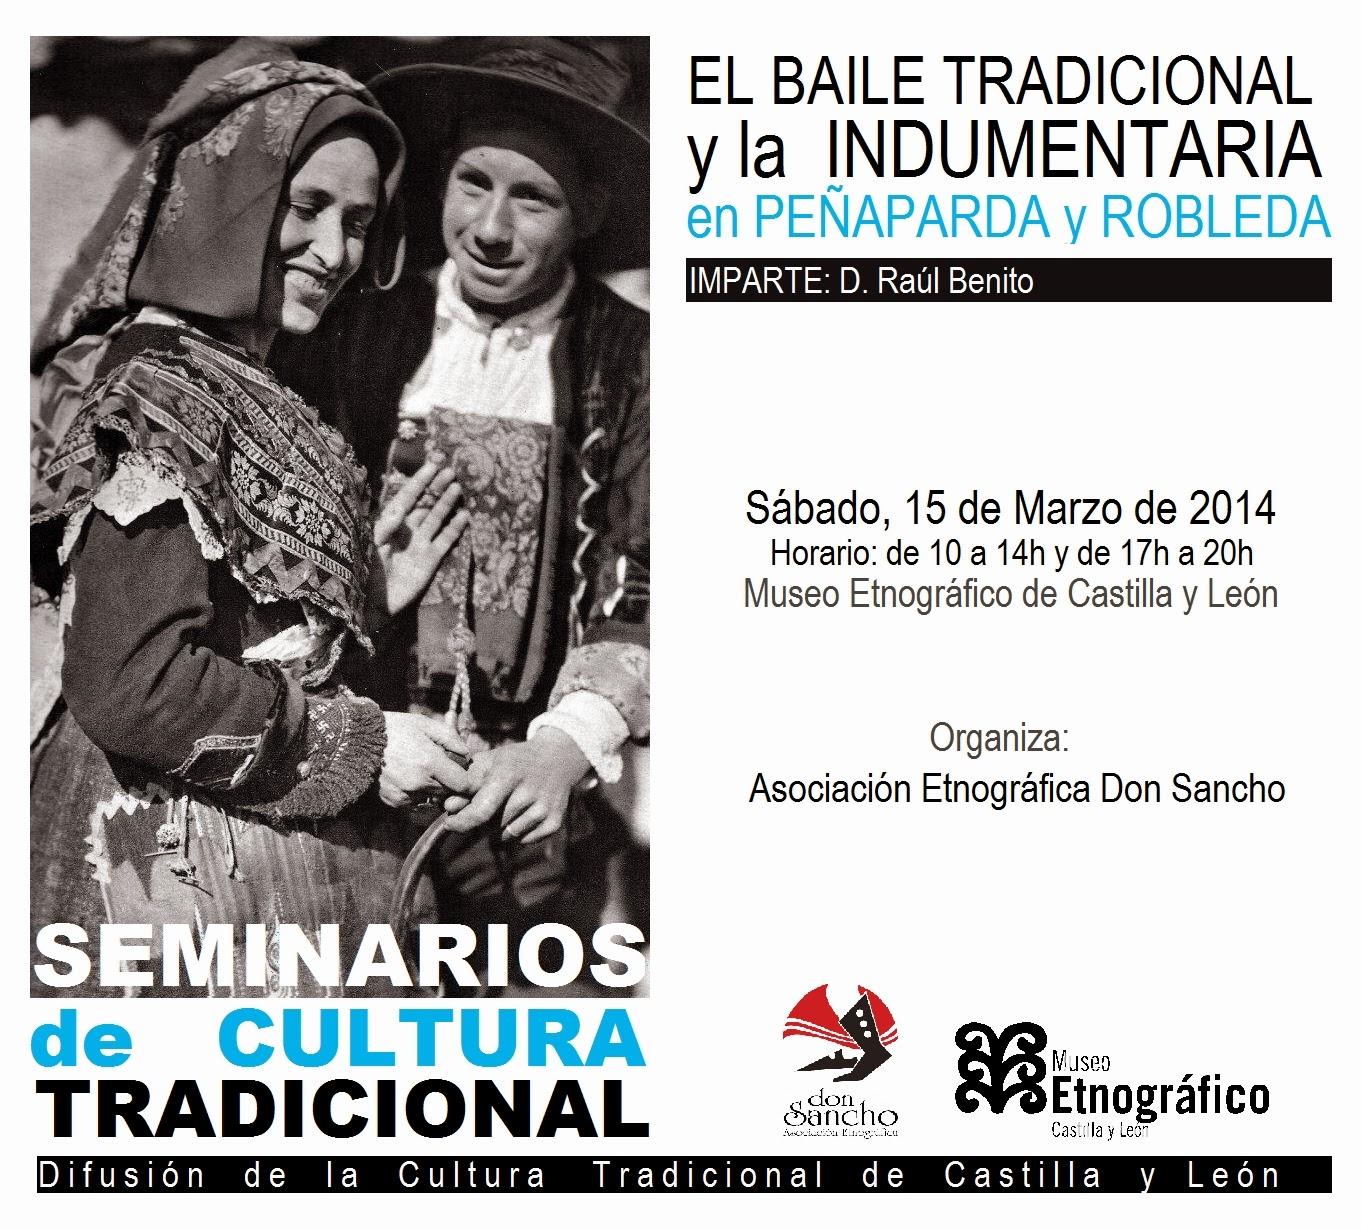 DON SANCHO. Difusión de la Cultura Tradicional de Zamora ... - photo#10